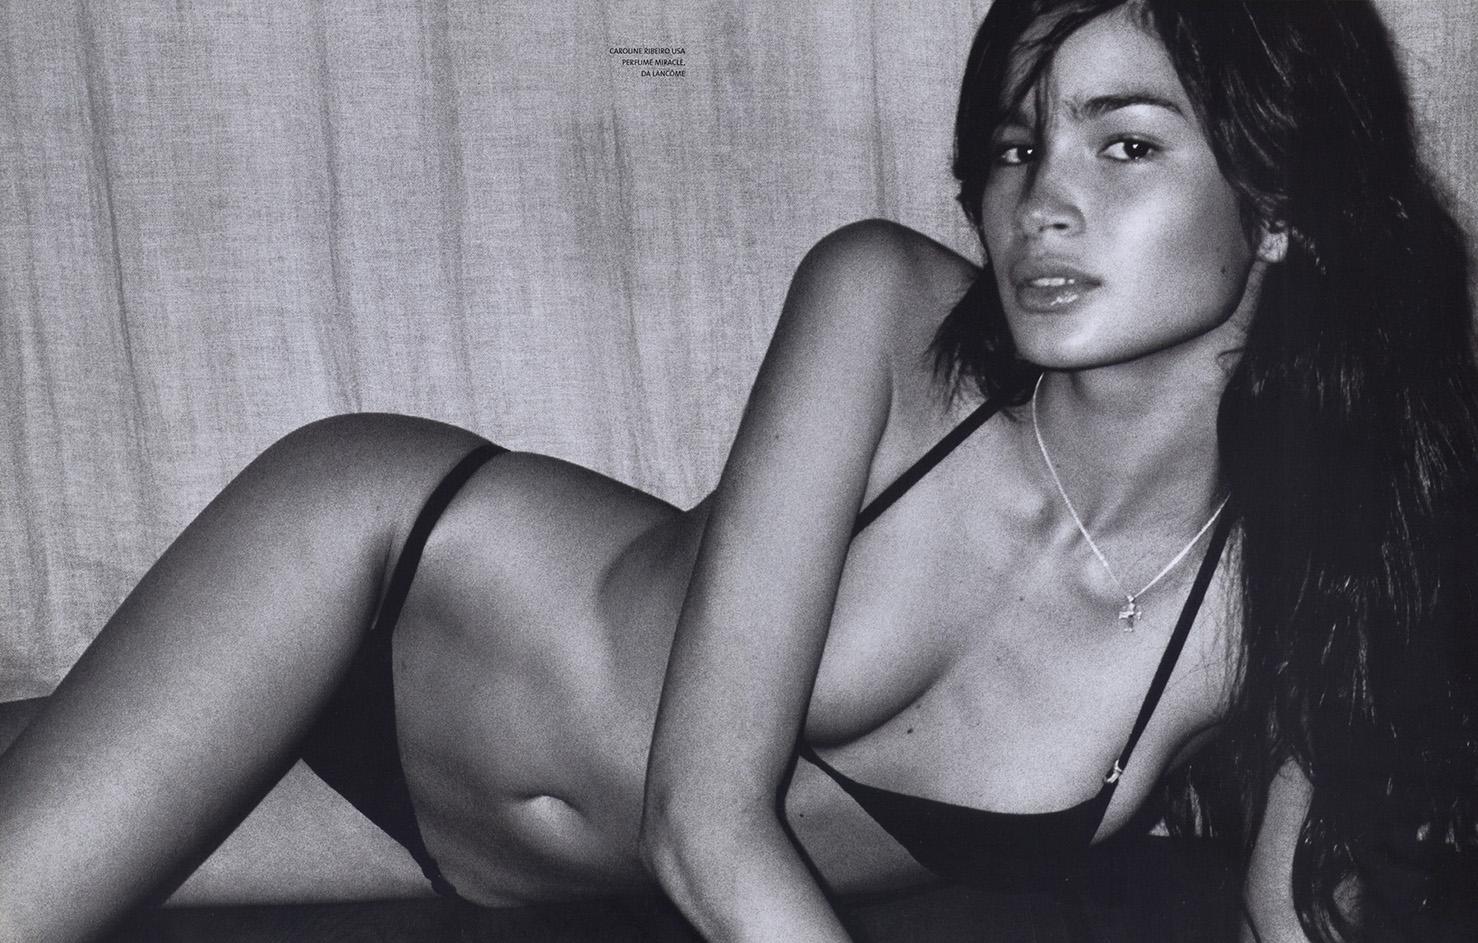 http://2.bp.blogspot.com/-IXy8S5vnty8/TiwvBpW1XQI/AAAAAAAACMg/3yTQICQvgWA/s1600/Caroline+Vogue+Brasil+Feb+2001+Testino.jpg